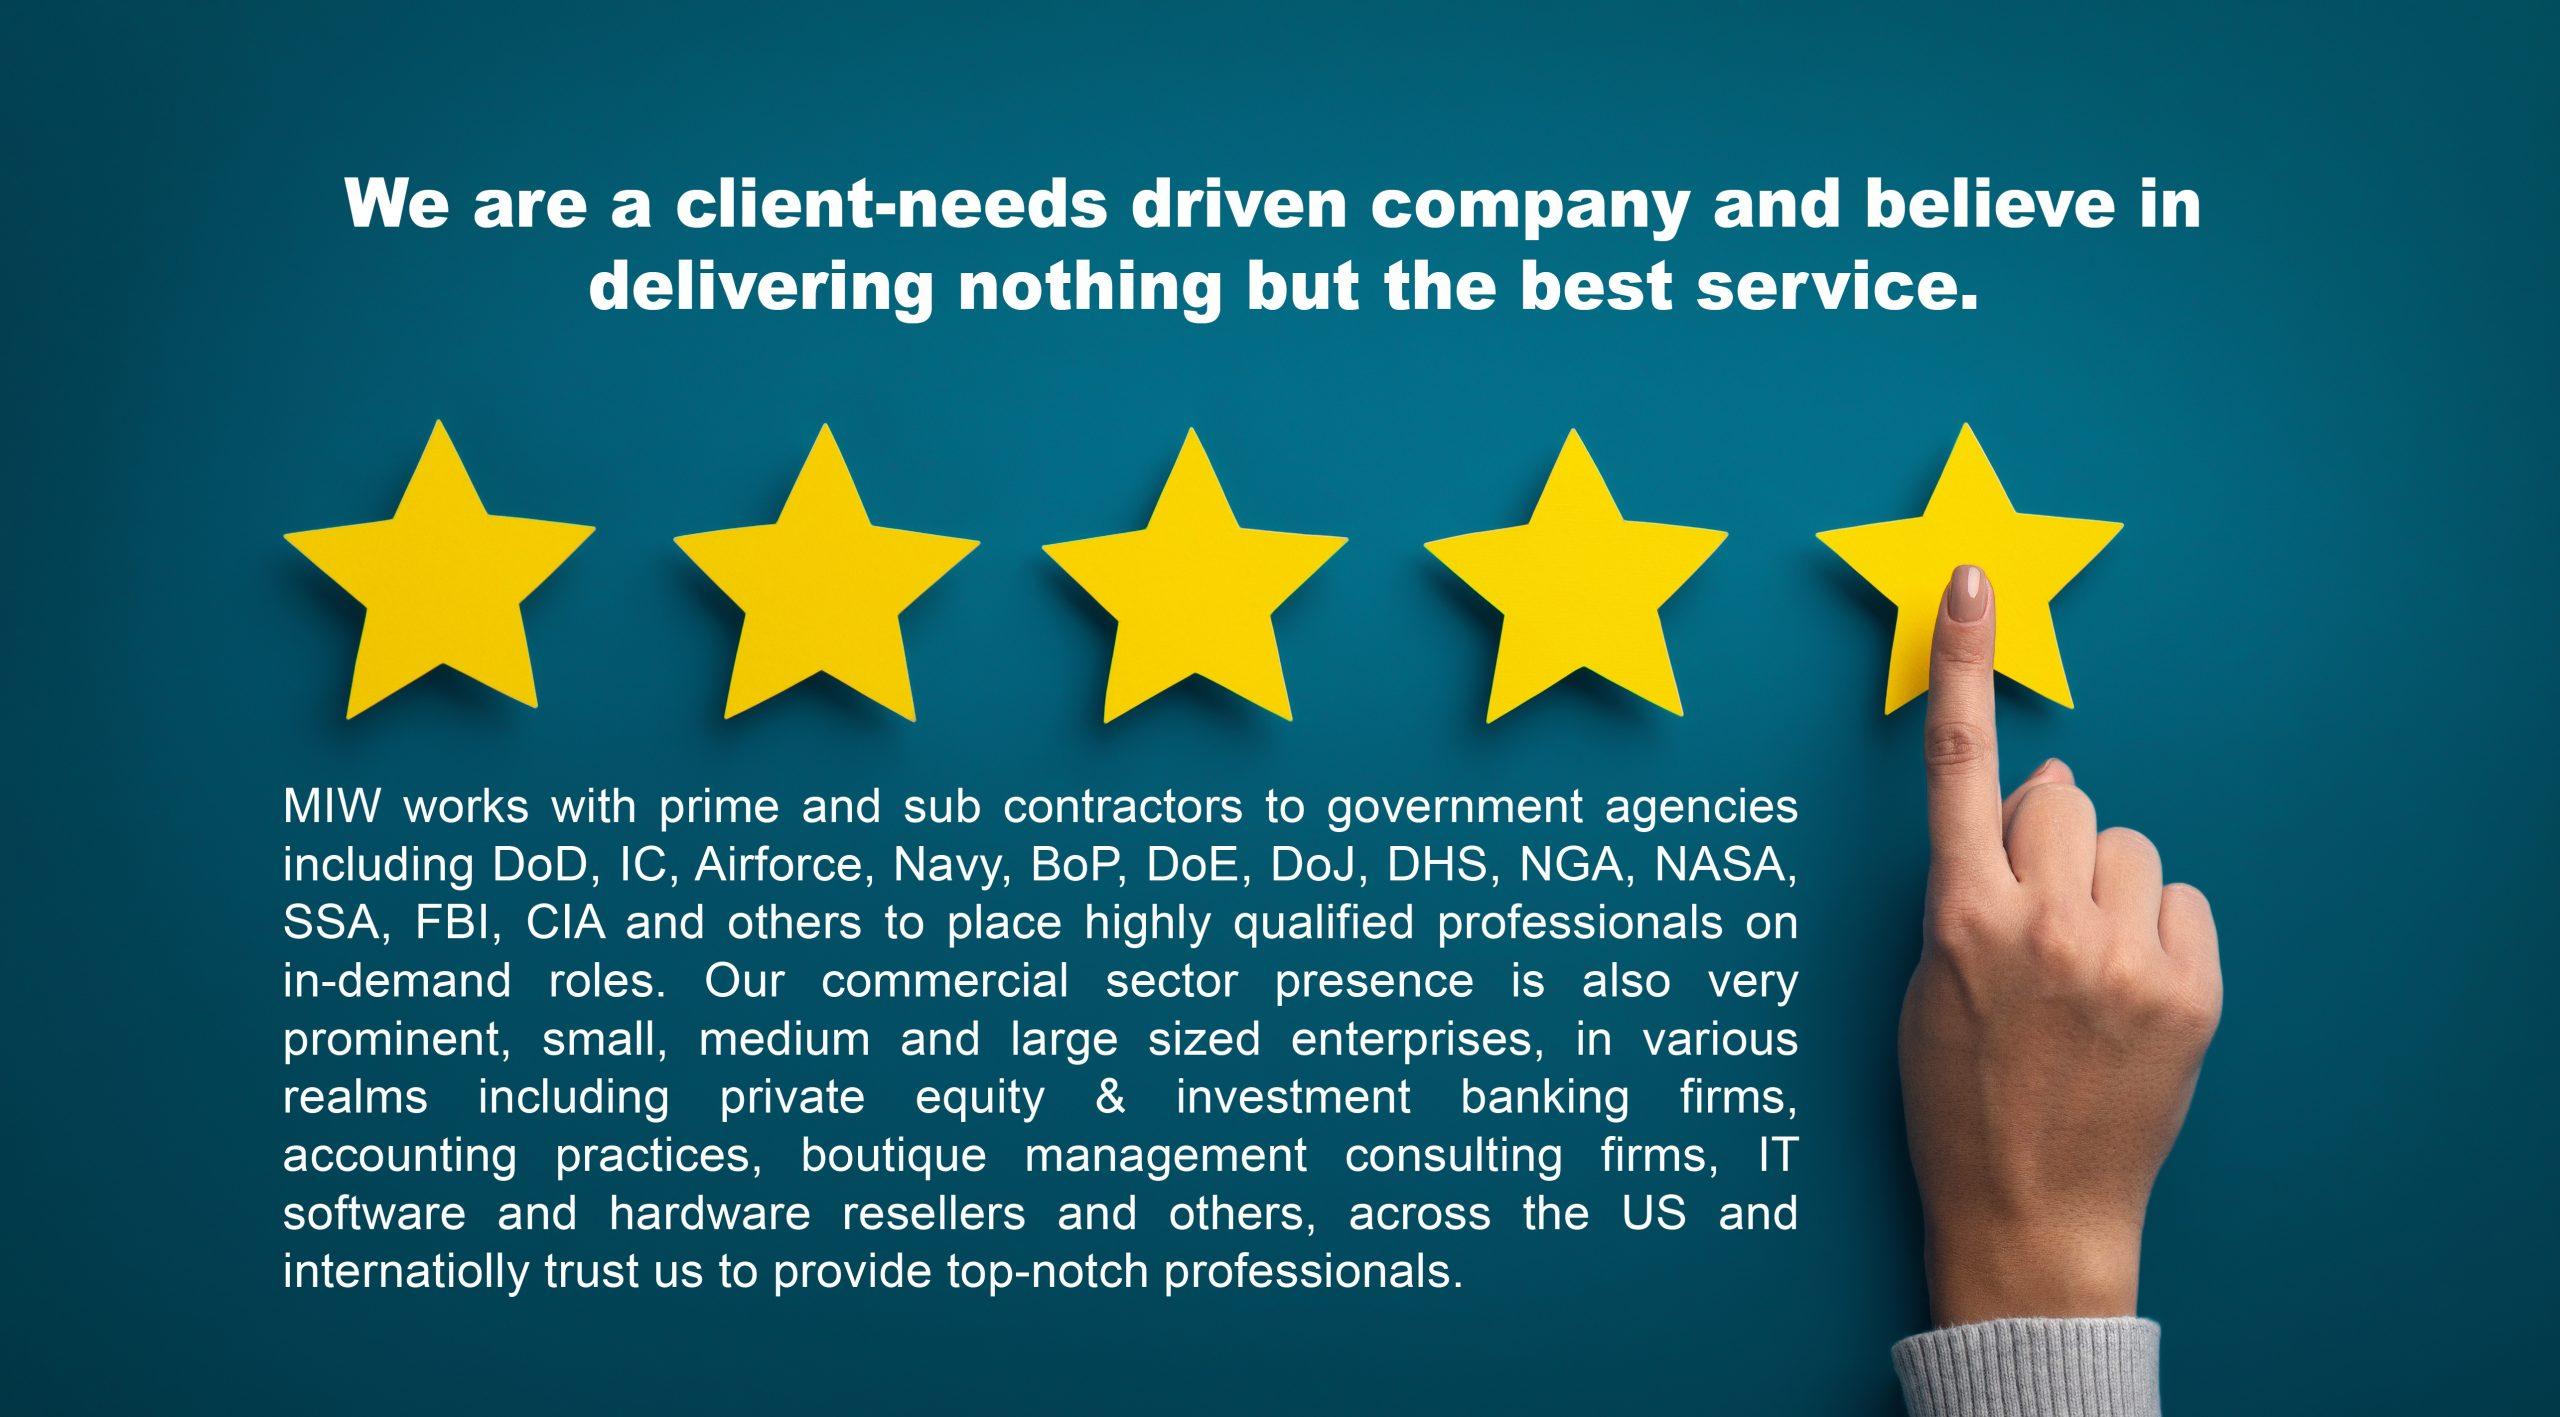 Client-needs